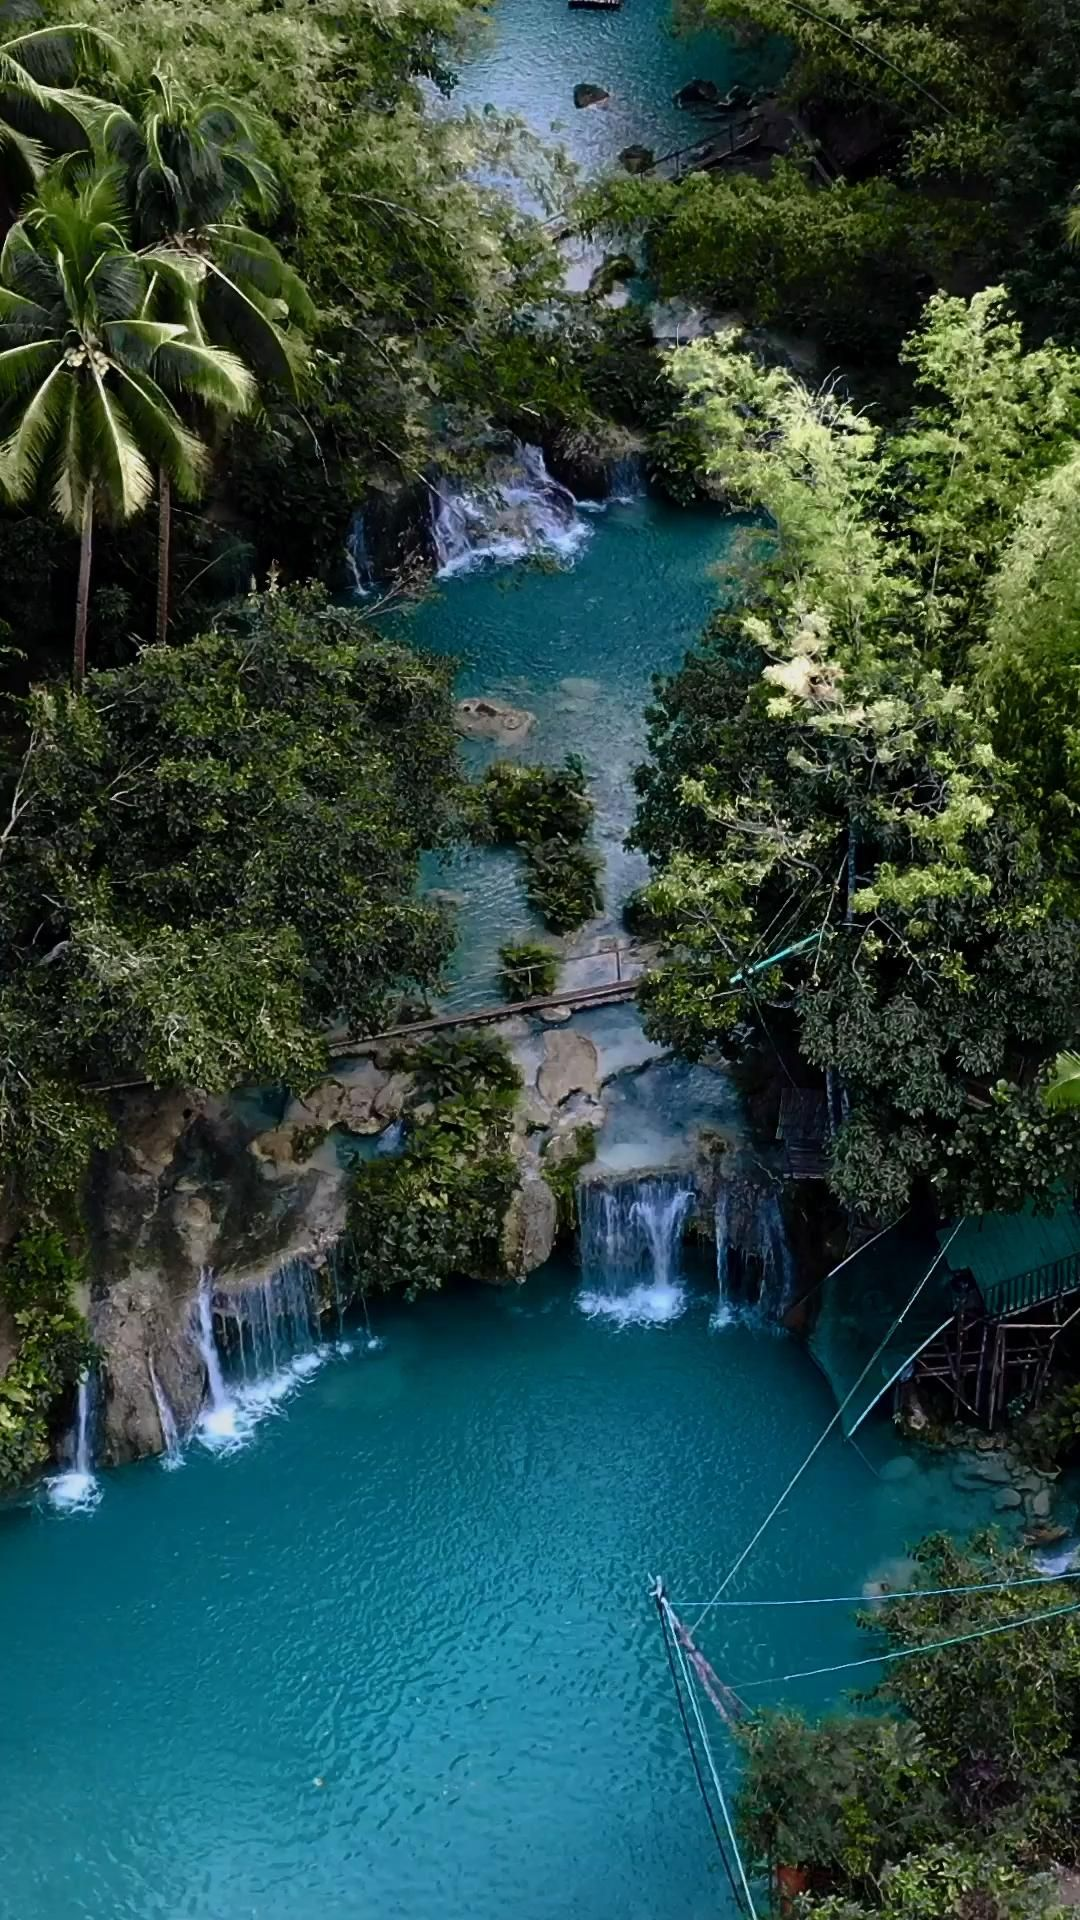 Cambugahaya Falls in the Philippines | Travel insp